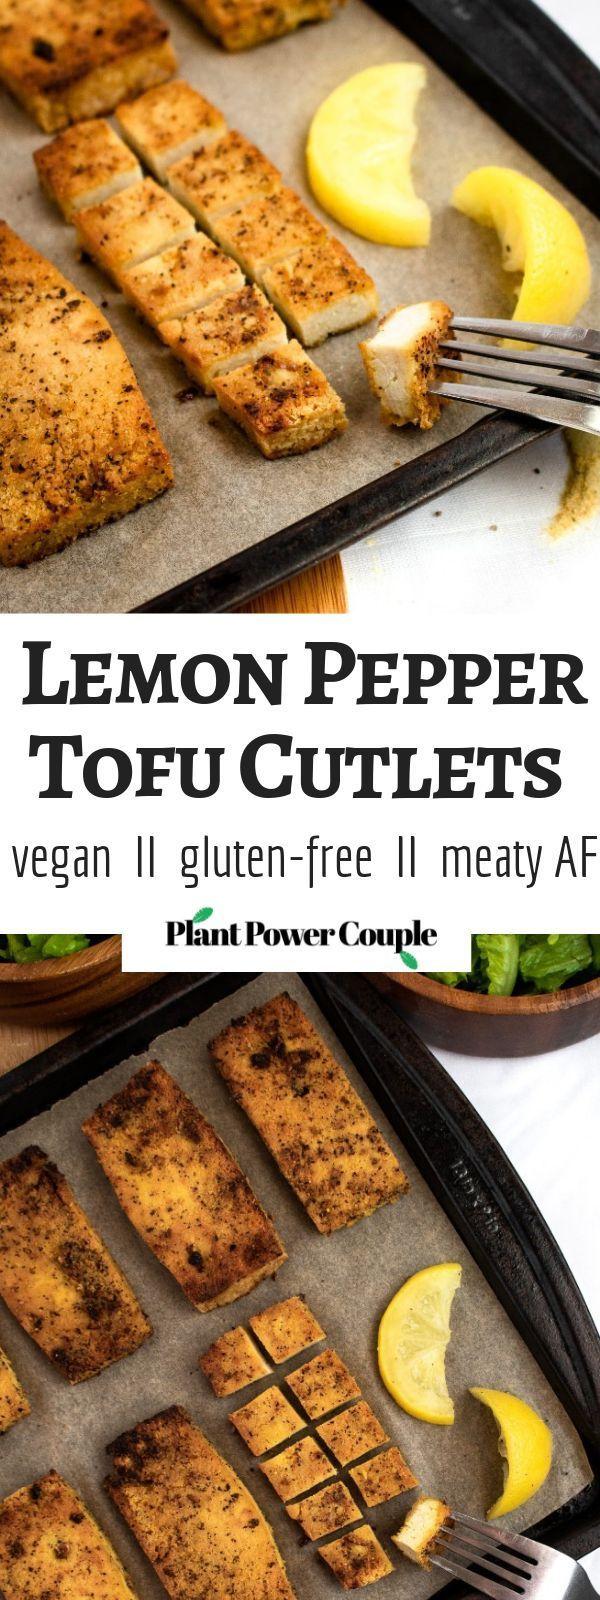 Zitronenpfeffer-Tofukoteletts sind die perfekte Es…